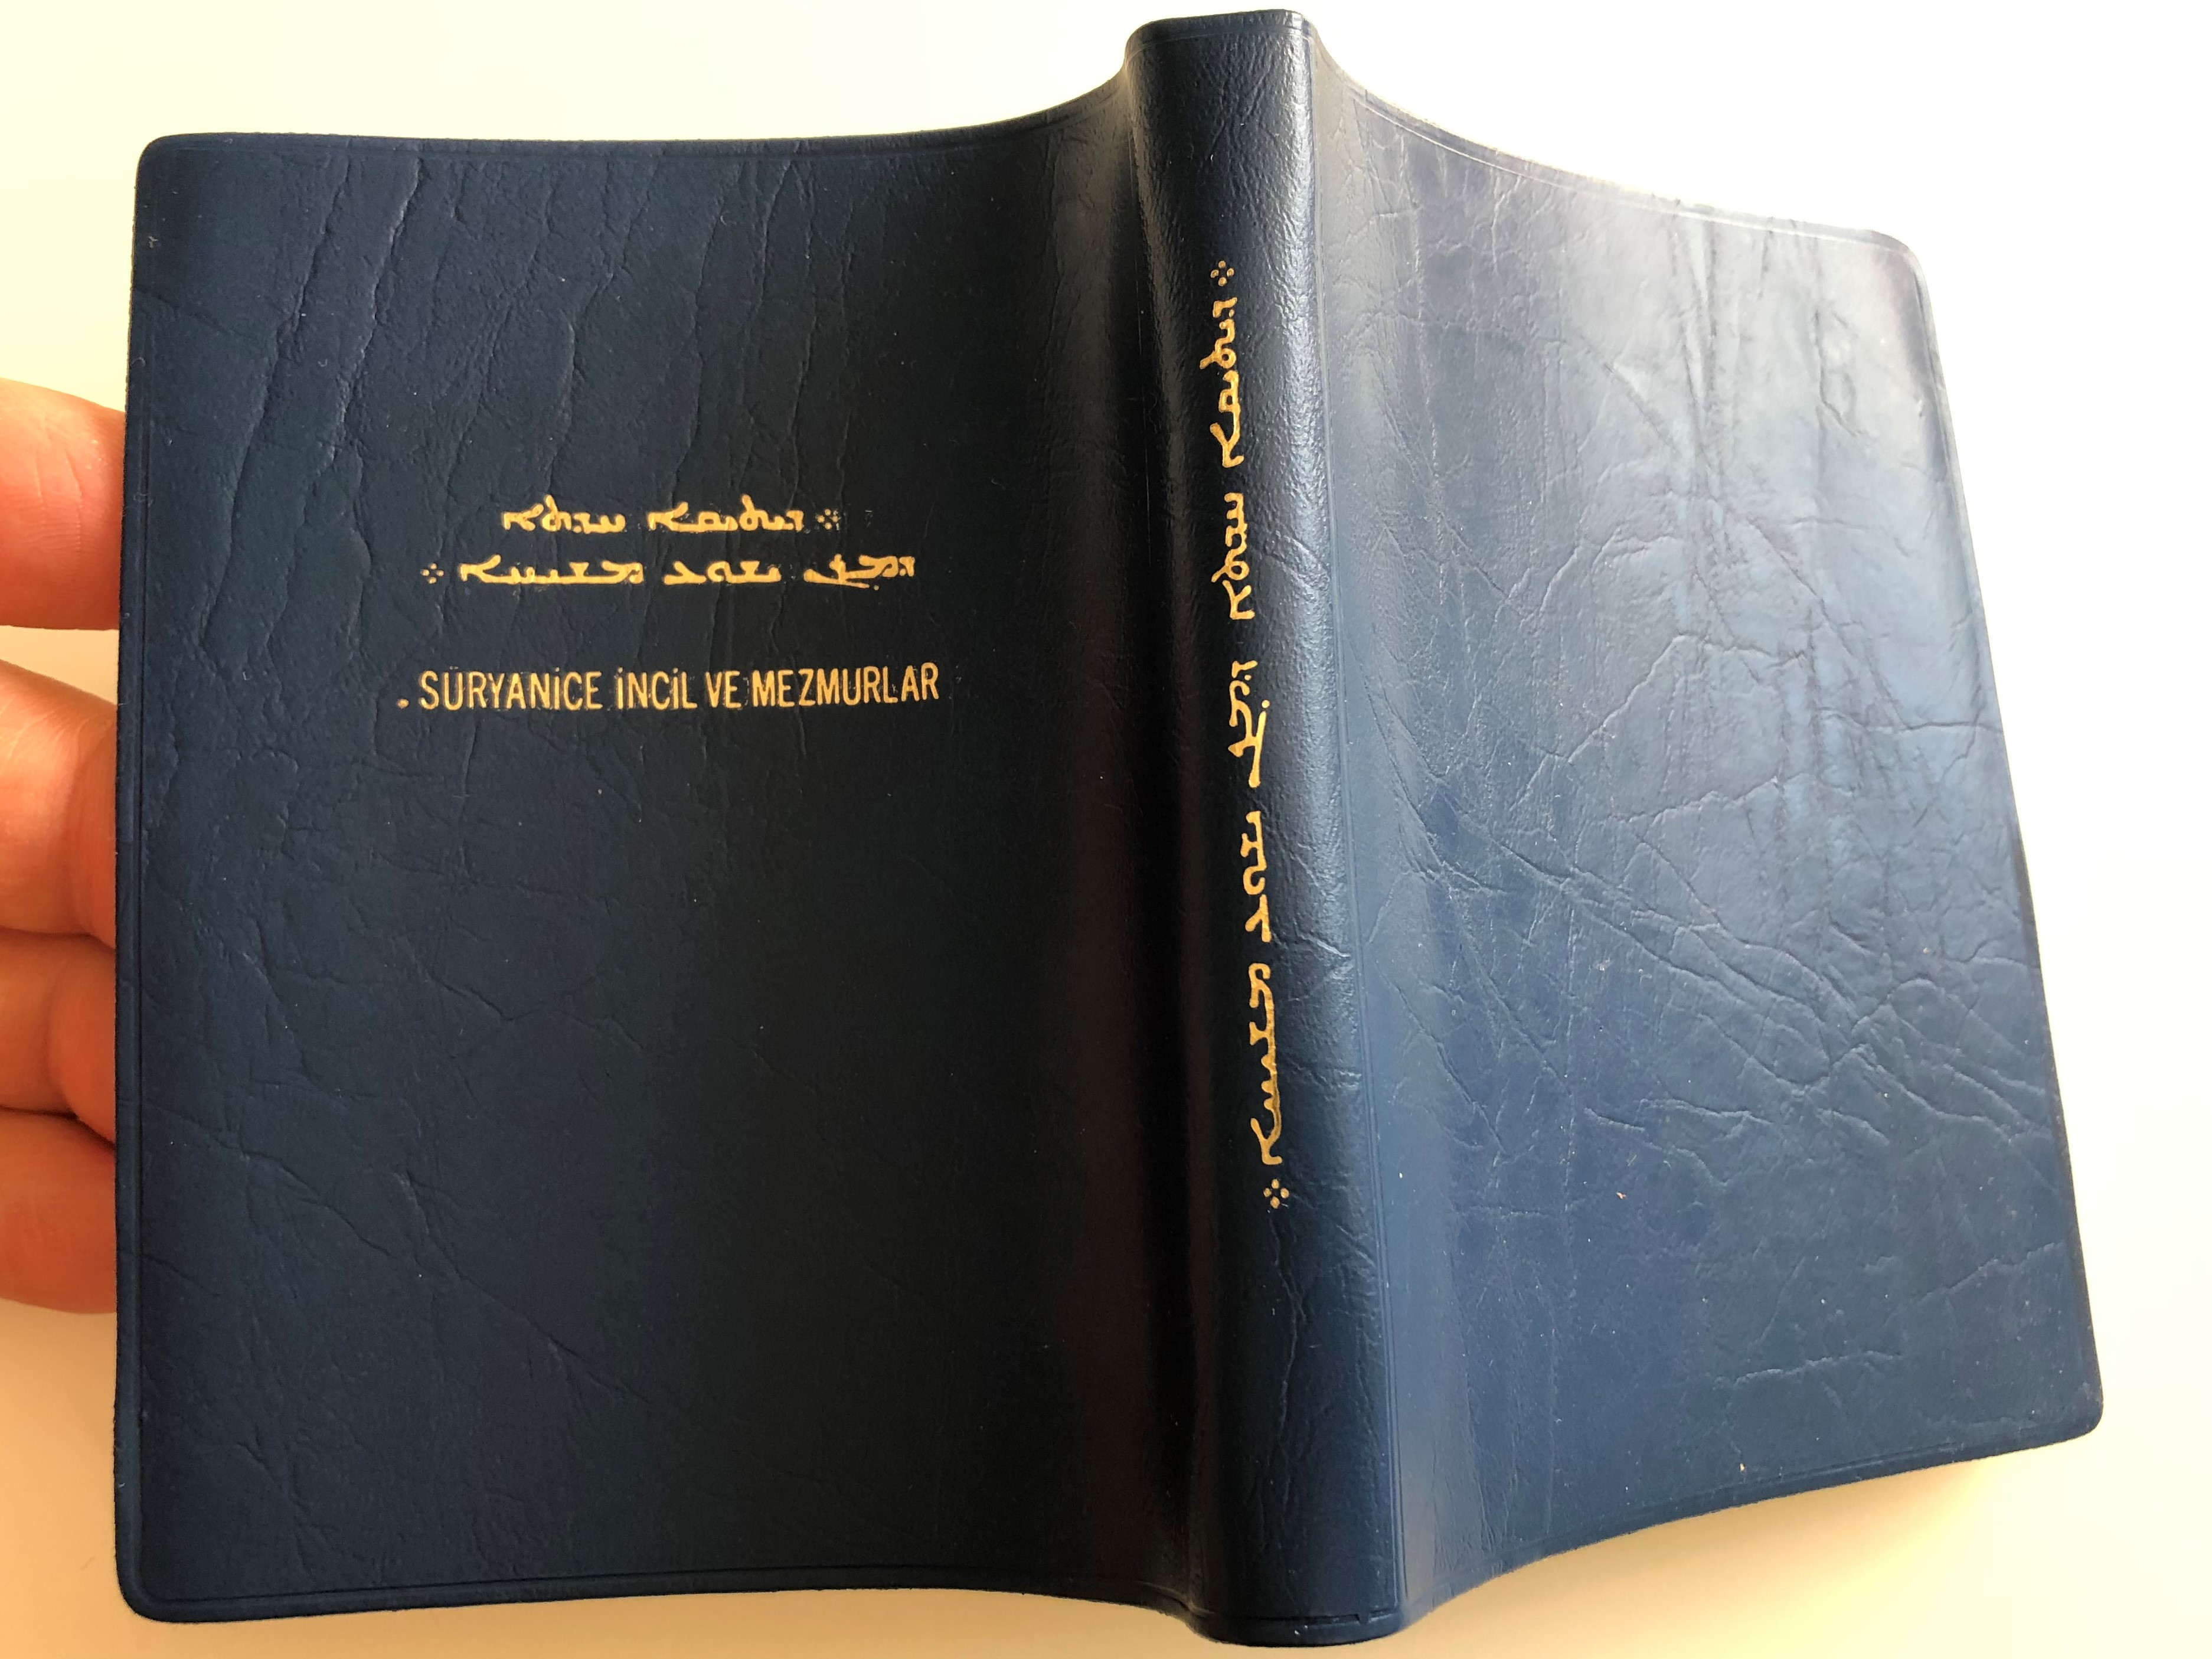 syriac-new-testament-and-psalms-s-ryanice-incil-ve-mezmurlar-blue-pocket-size-edition-342-ubs-epf-1991-4m-2.jpg